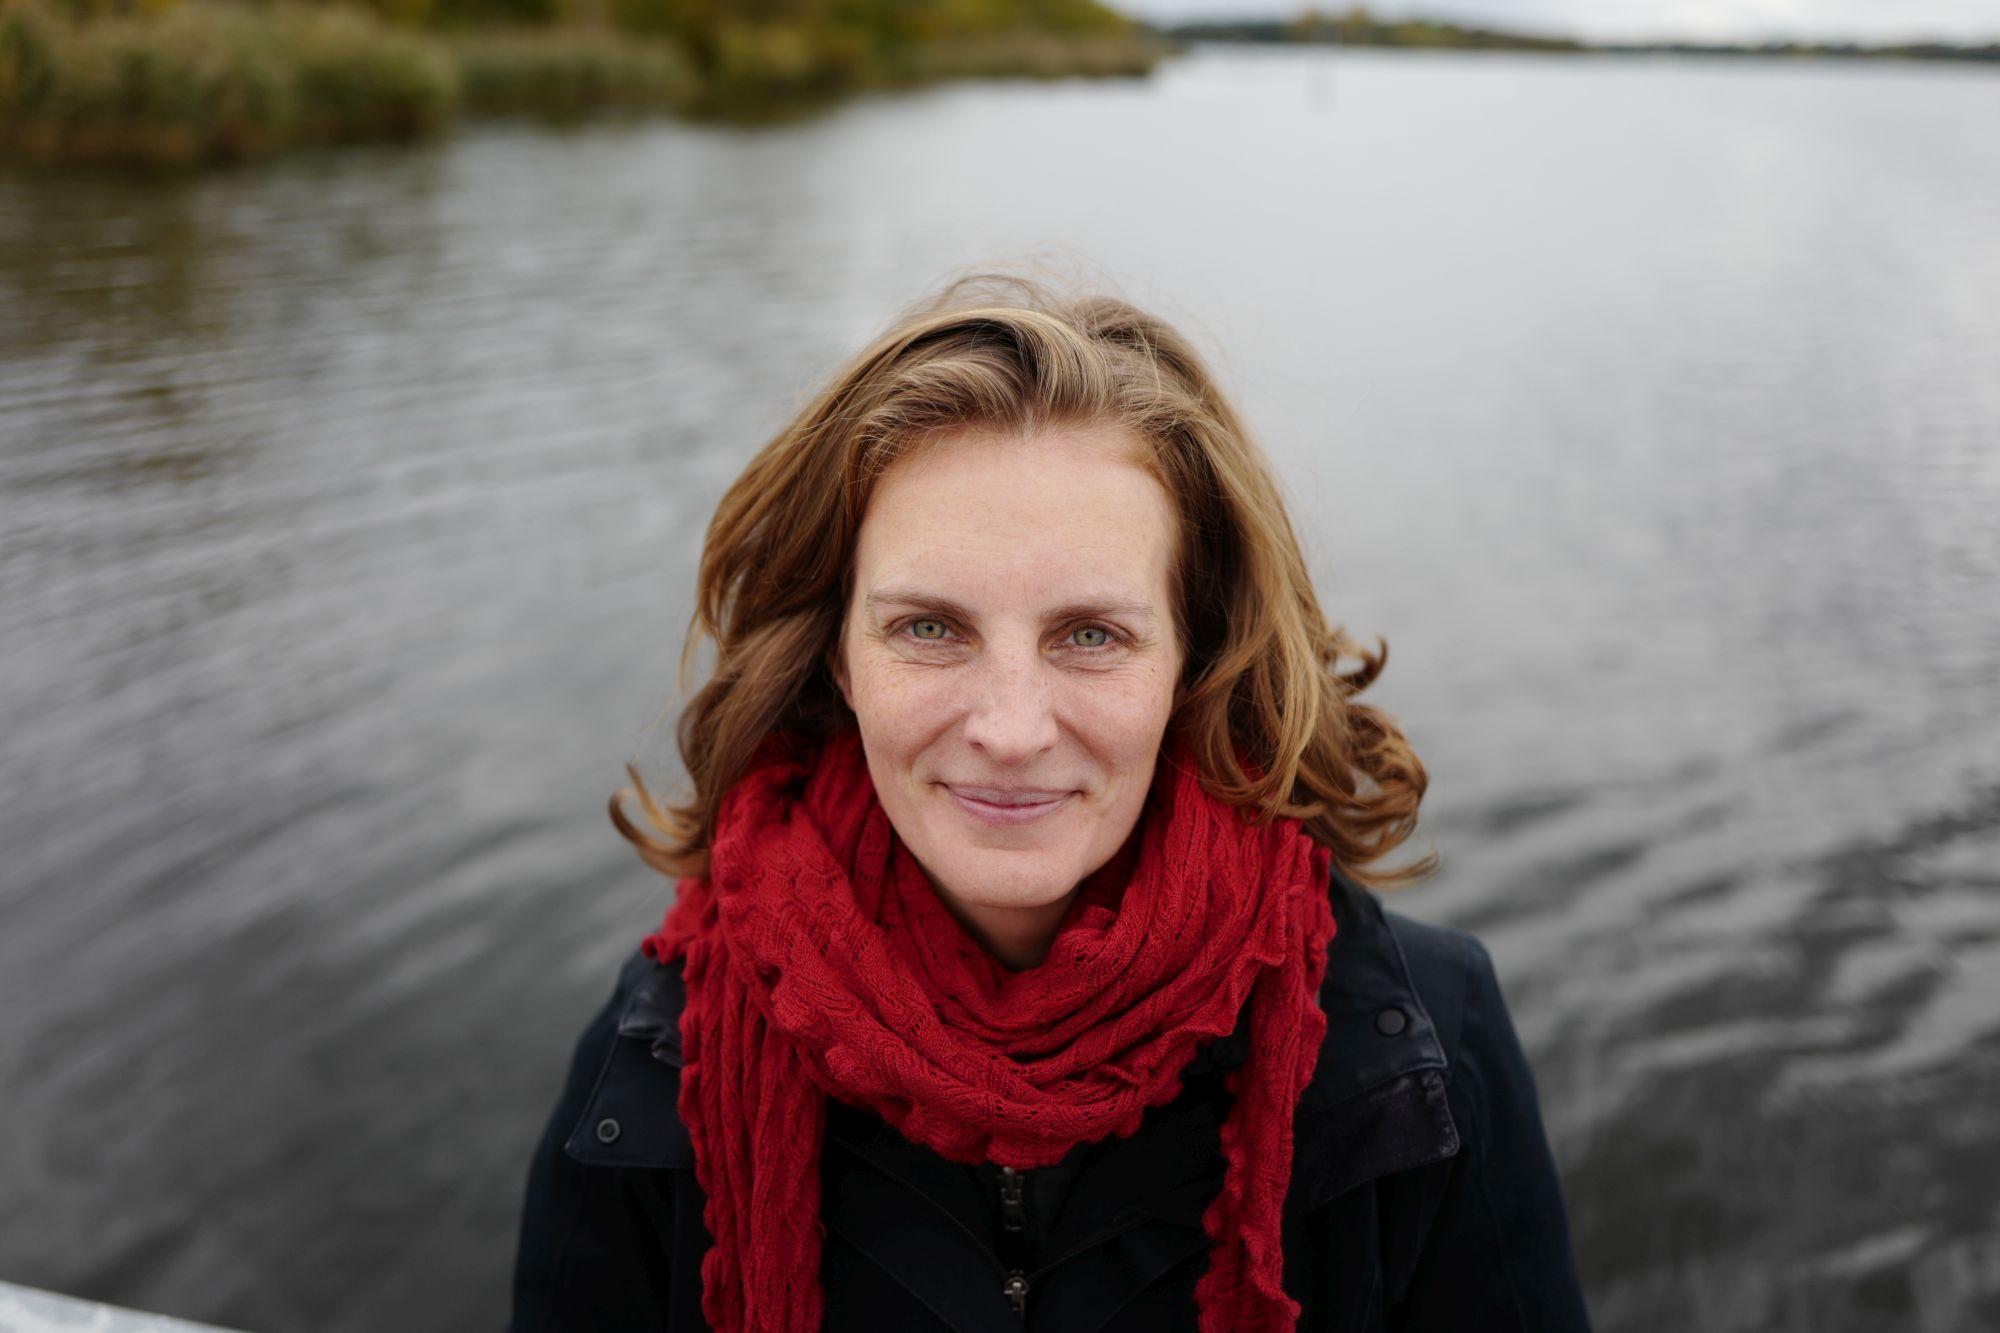 Anna Haas (Trainer Kandidatin)